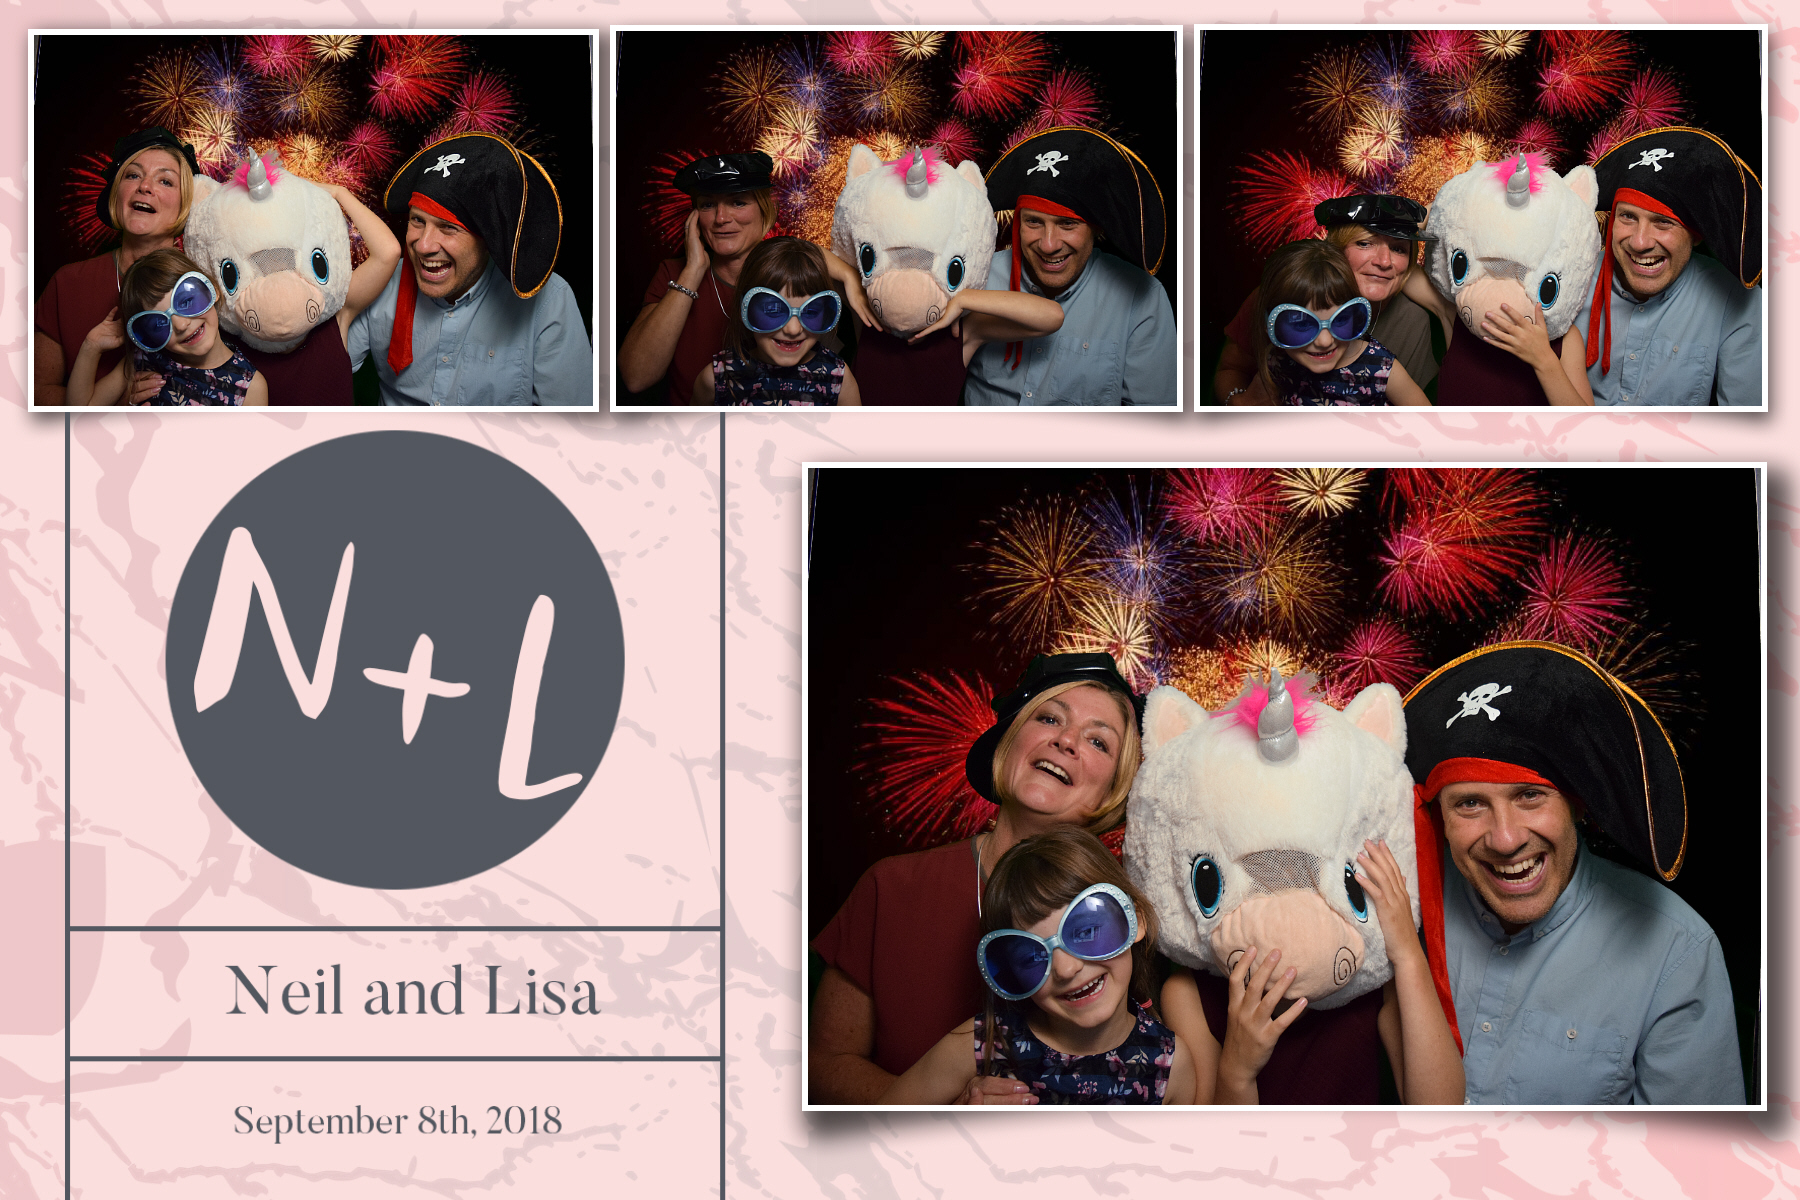 Neil & Lisa - Hilton Sheffield - Photo booth